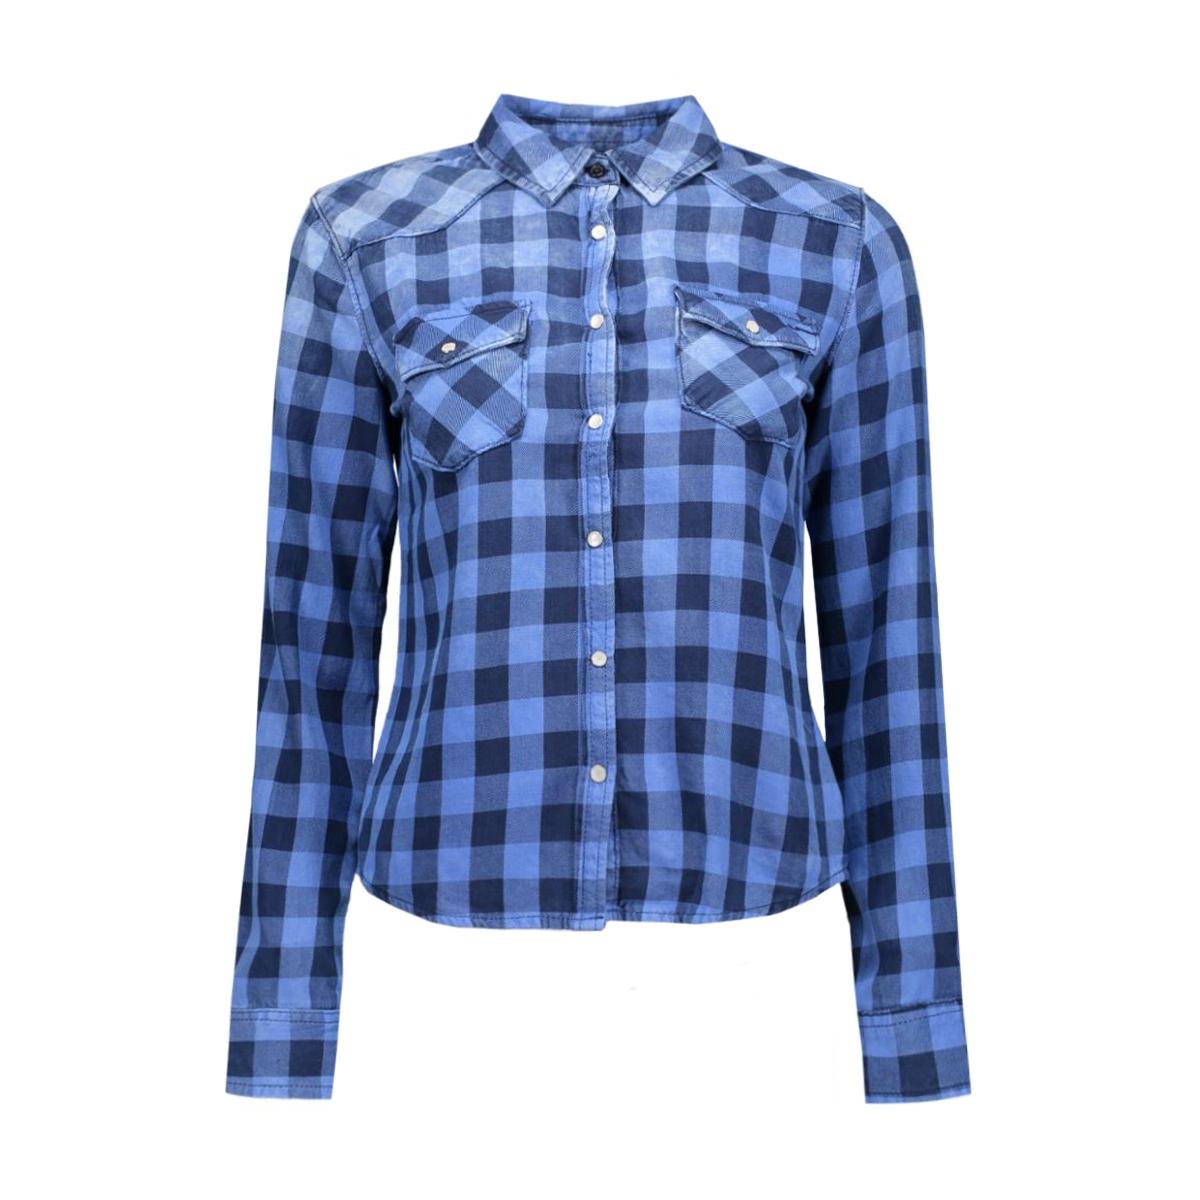 100960474.13576 ltb blouse 4173